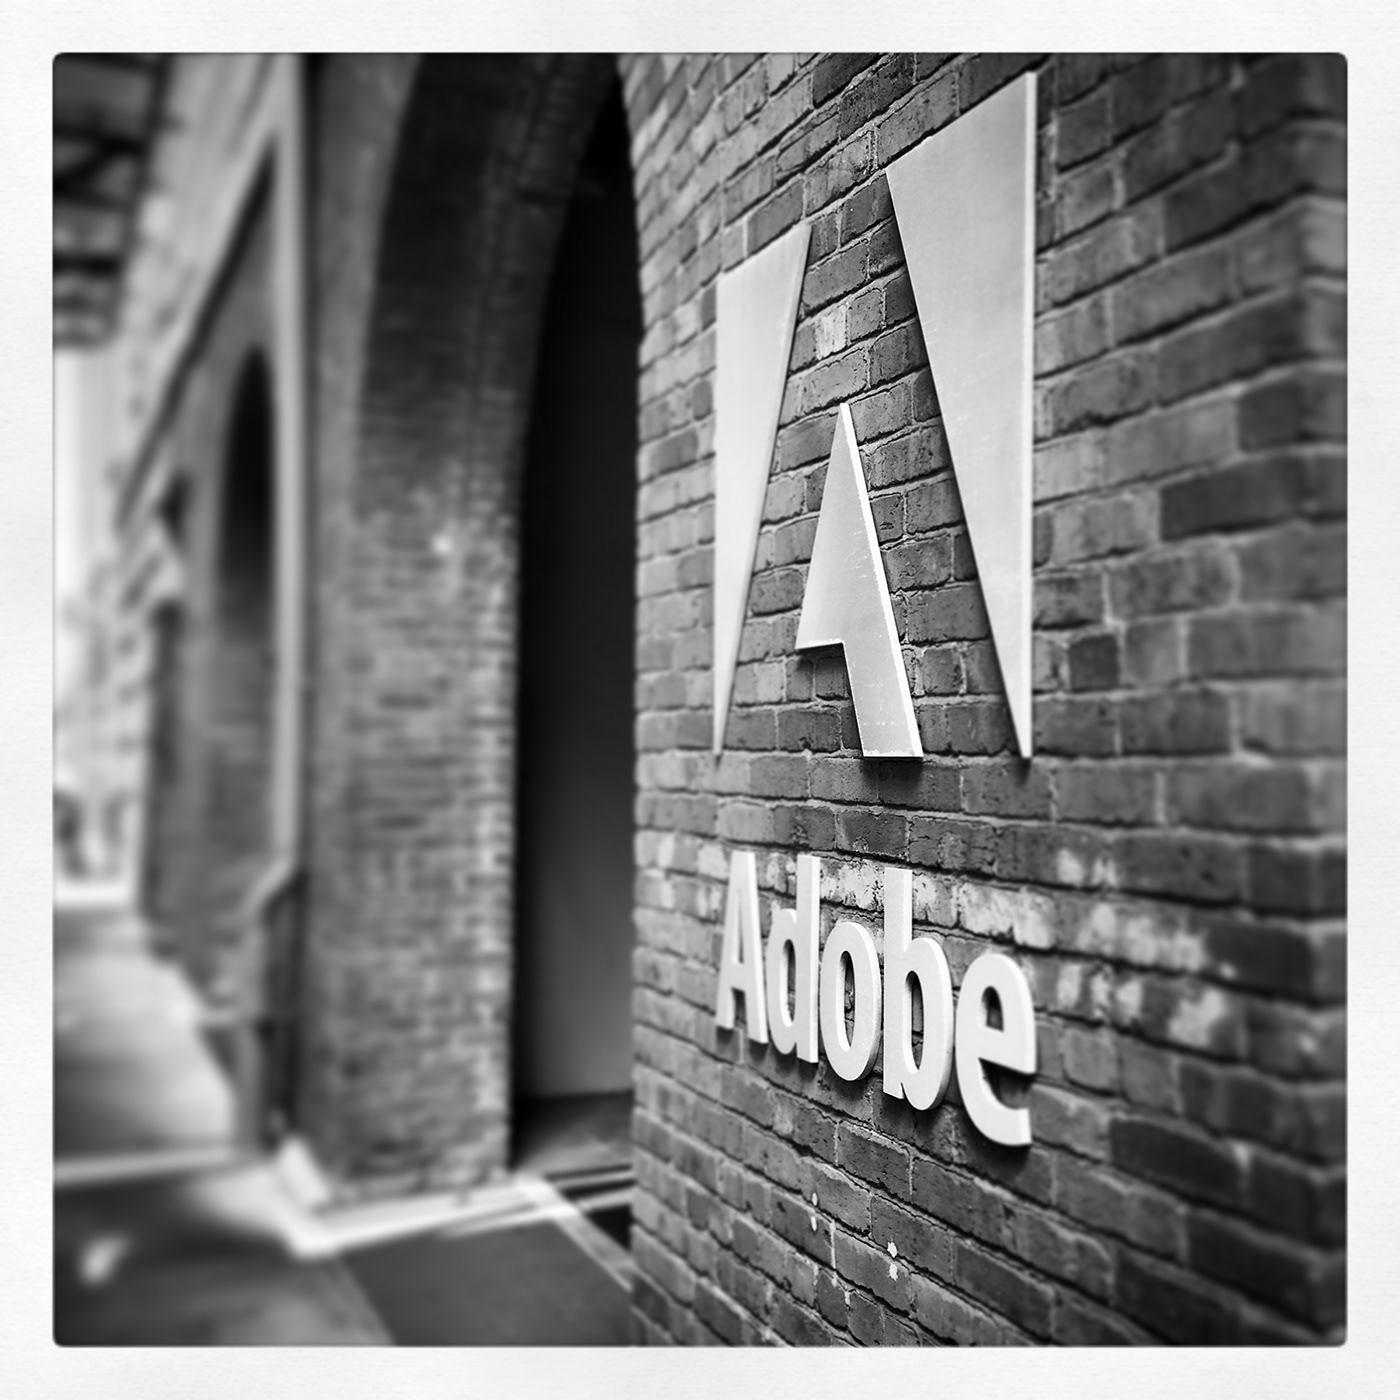 adobe anniversary career self-reflection